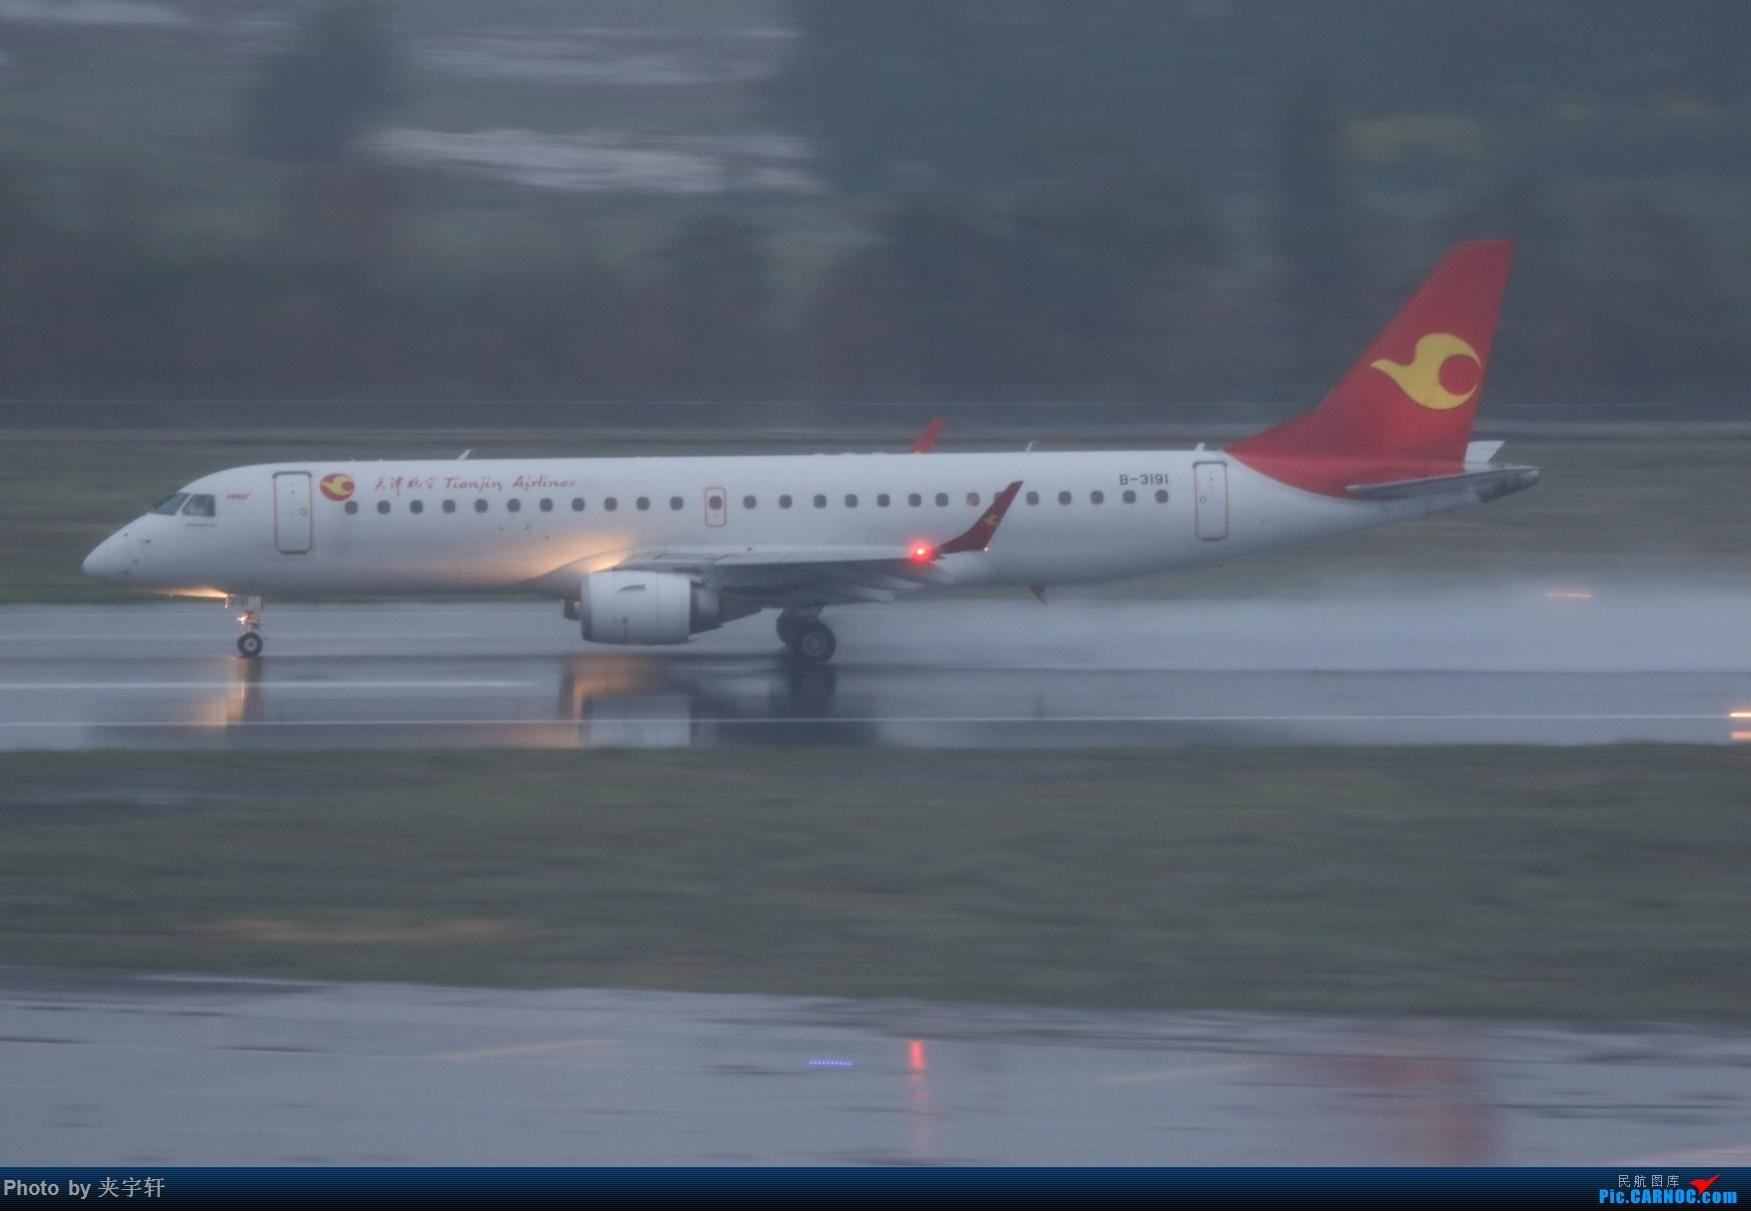 Re:[原创]【URC】雨天动图!+吹水 EMBRAER E-190 B-3191 中国乌鲁木齐地窝堡国际机场